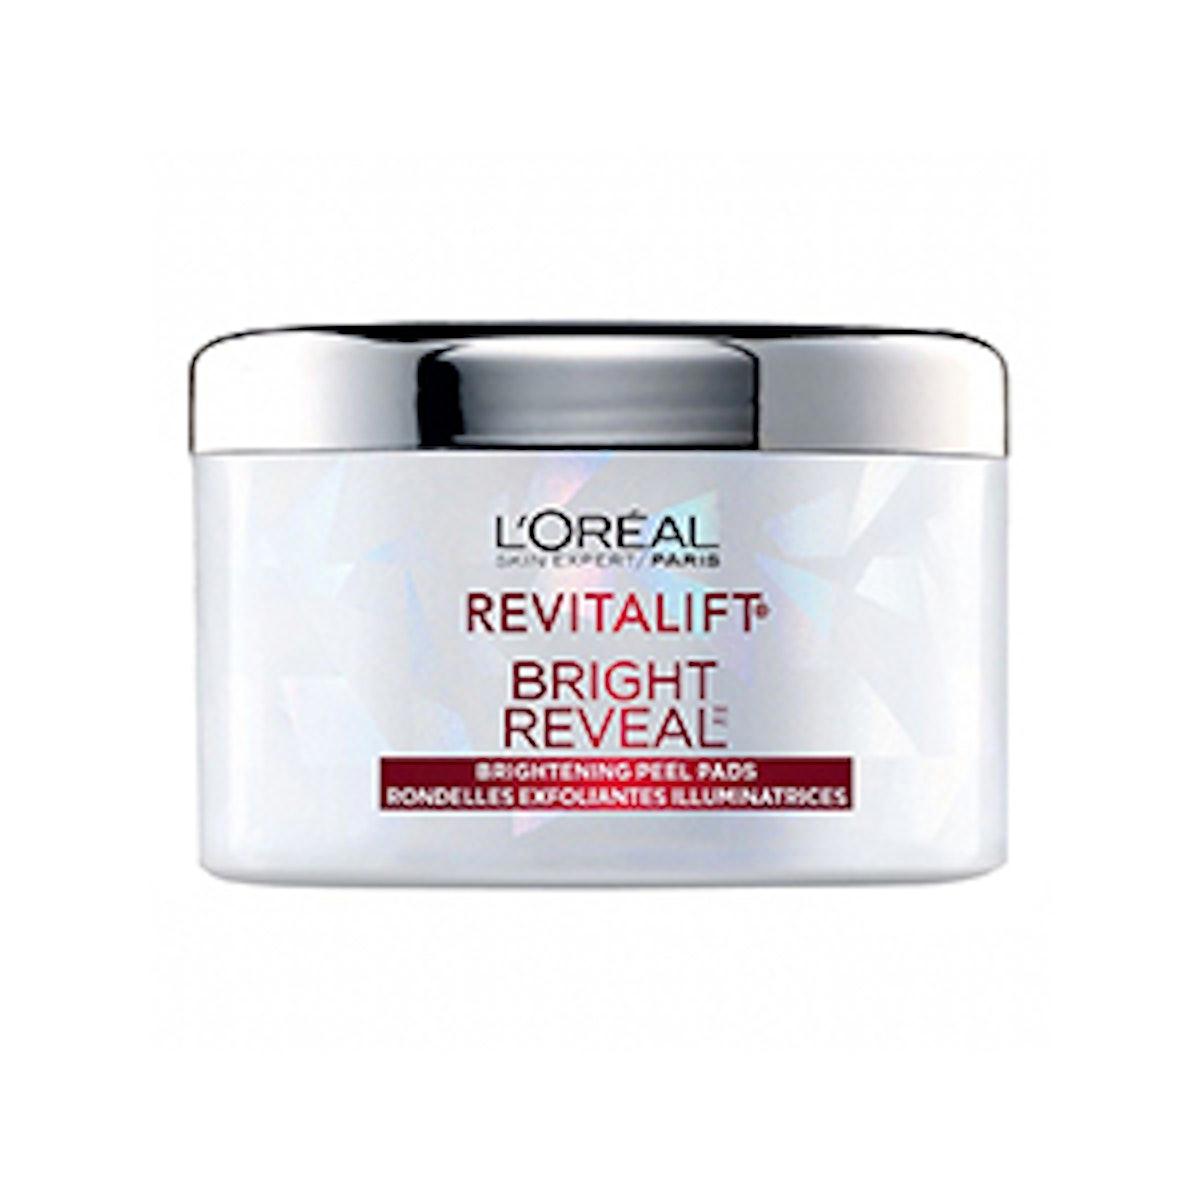 L'Oréal Revitalift Bright Reveal Peel Pad